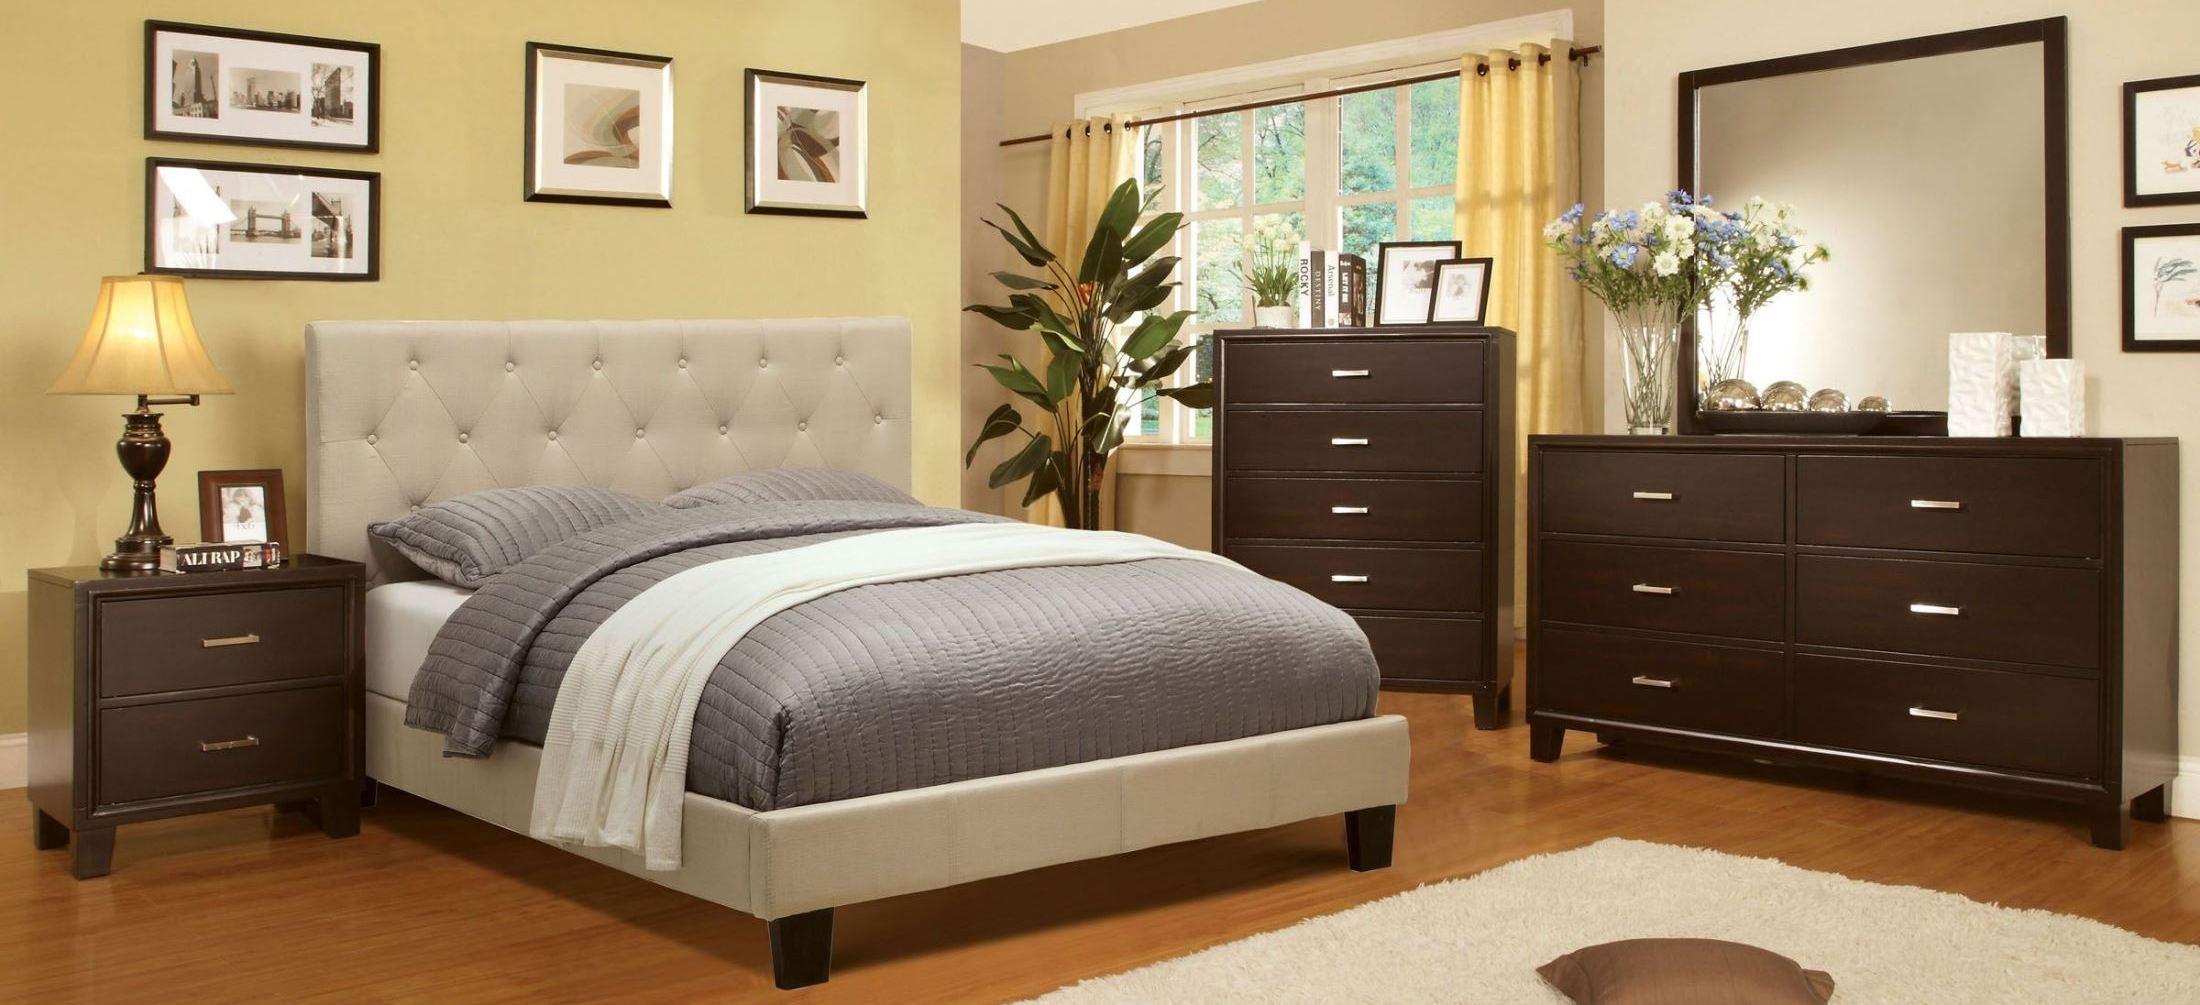 Leeroy Ivory Fabric Platform Bedroom Set From Furniture Of